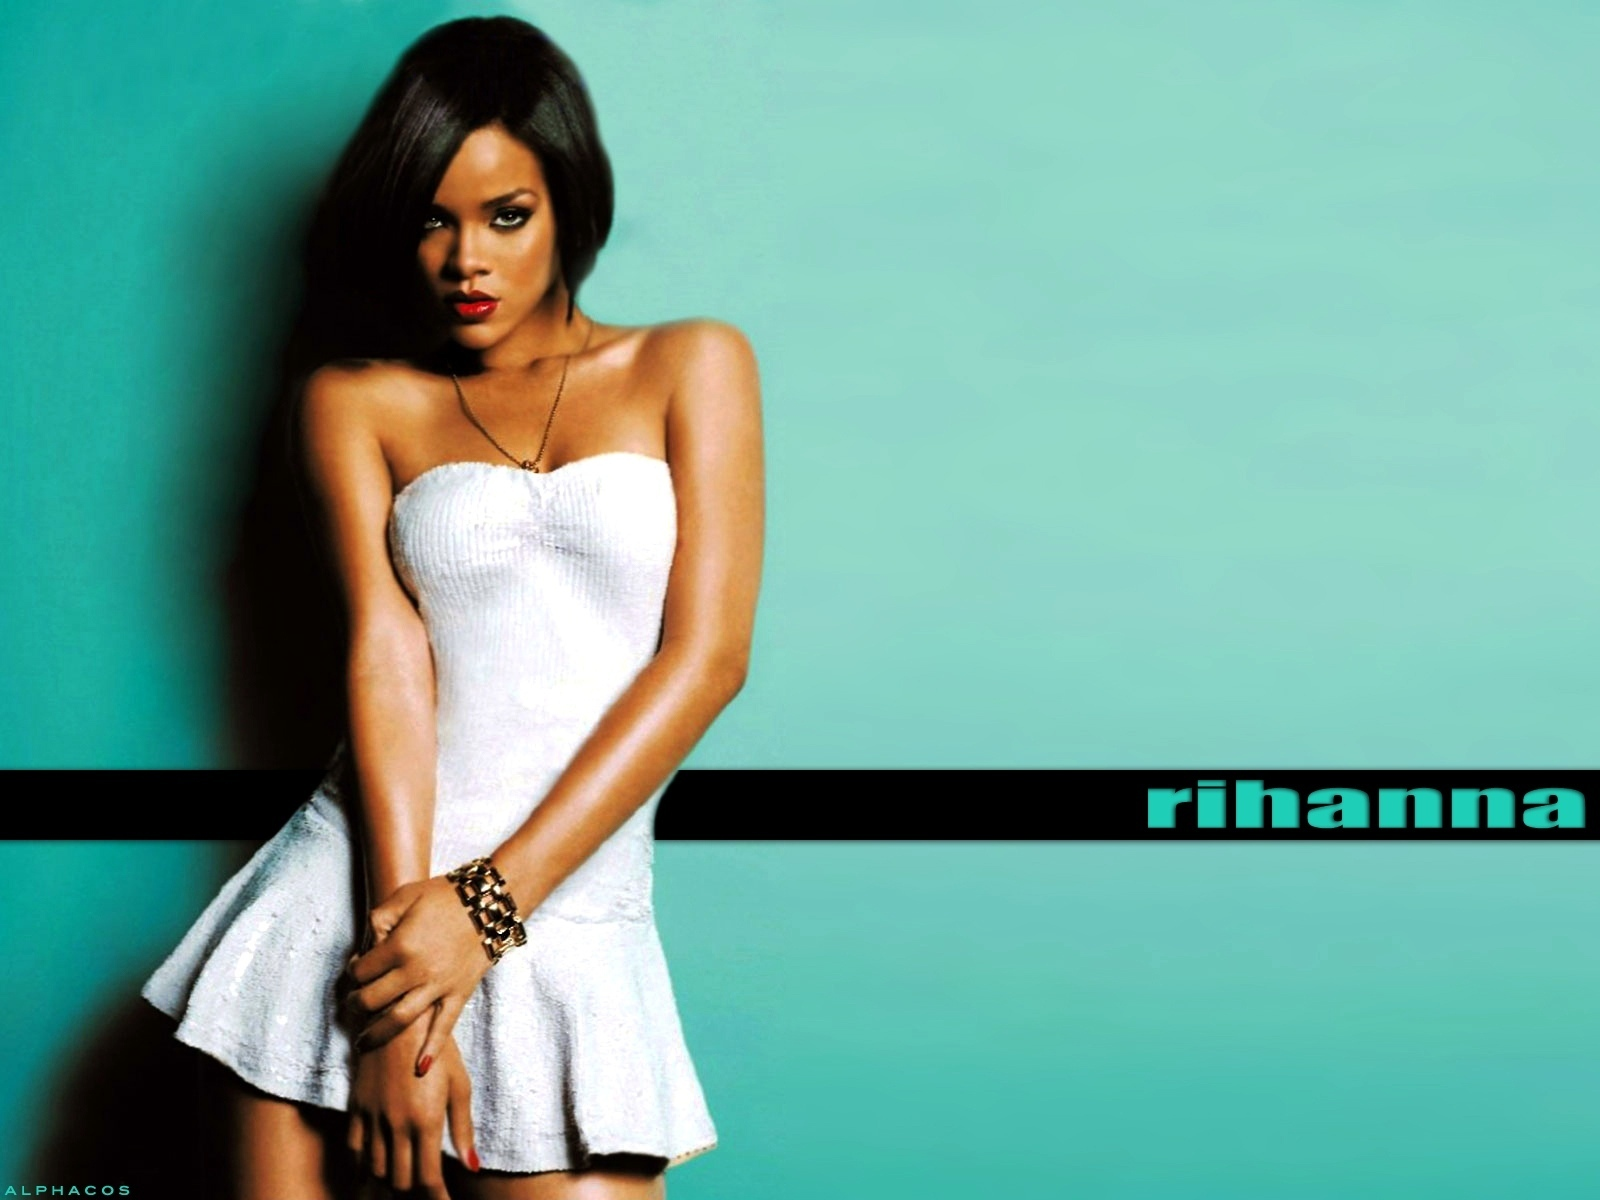 rihanna - Rihanna Wallpaper (1453207) - Fanpop Rihanna